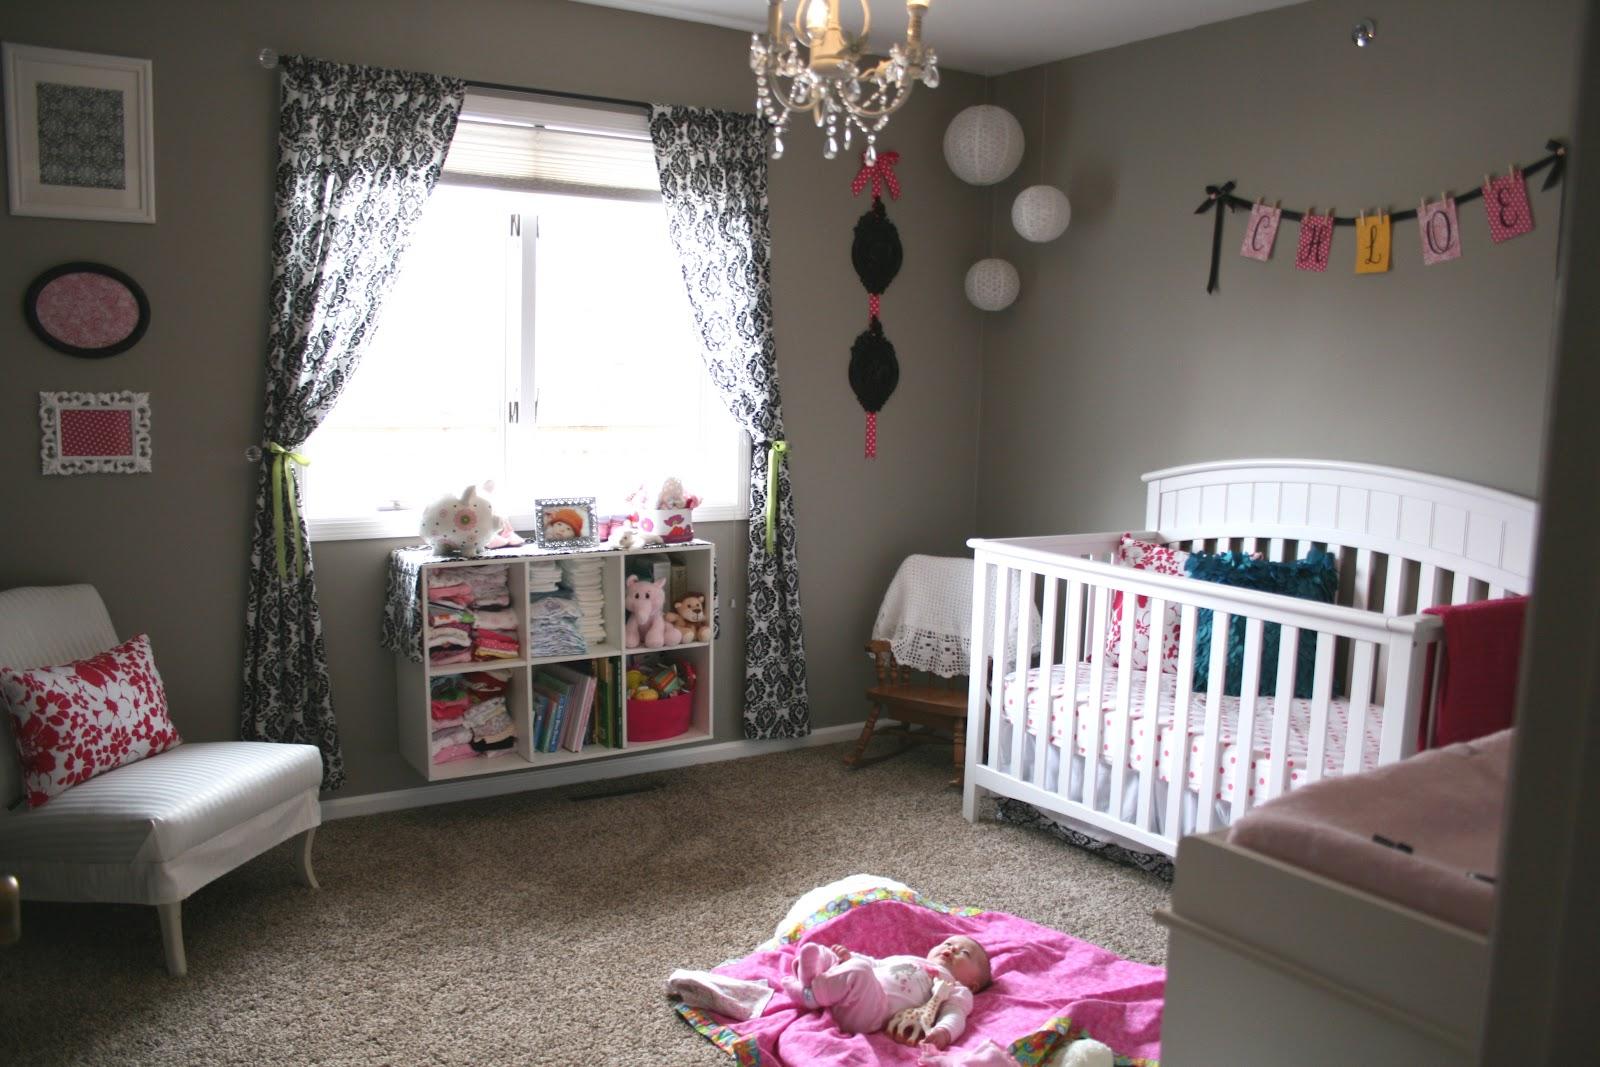 & The Nursery